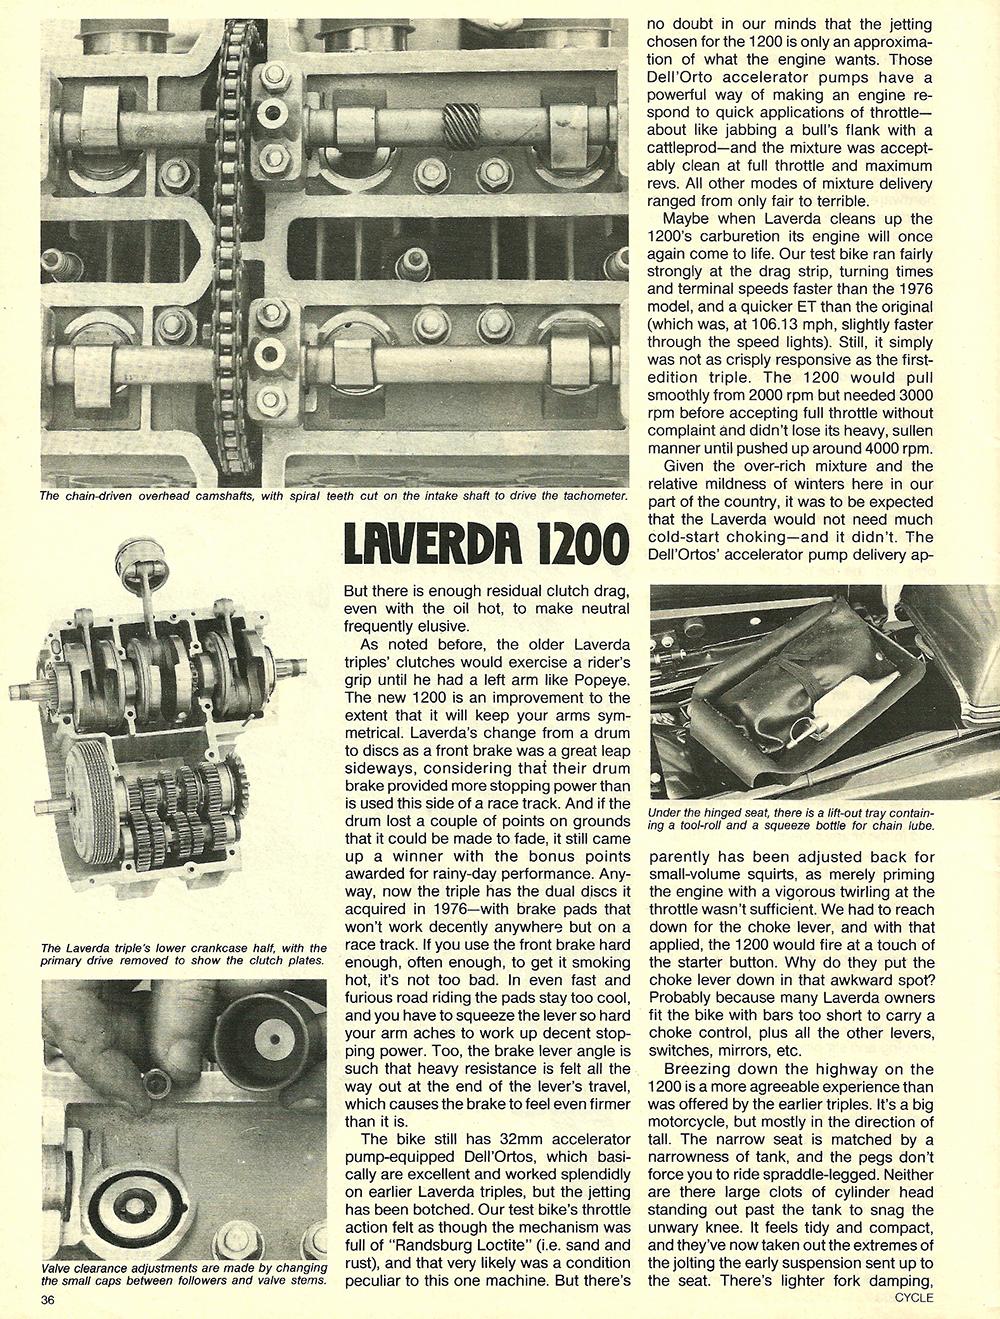 1978 Laverda 1200 Jota America road test 5.jpg